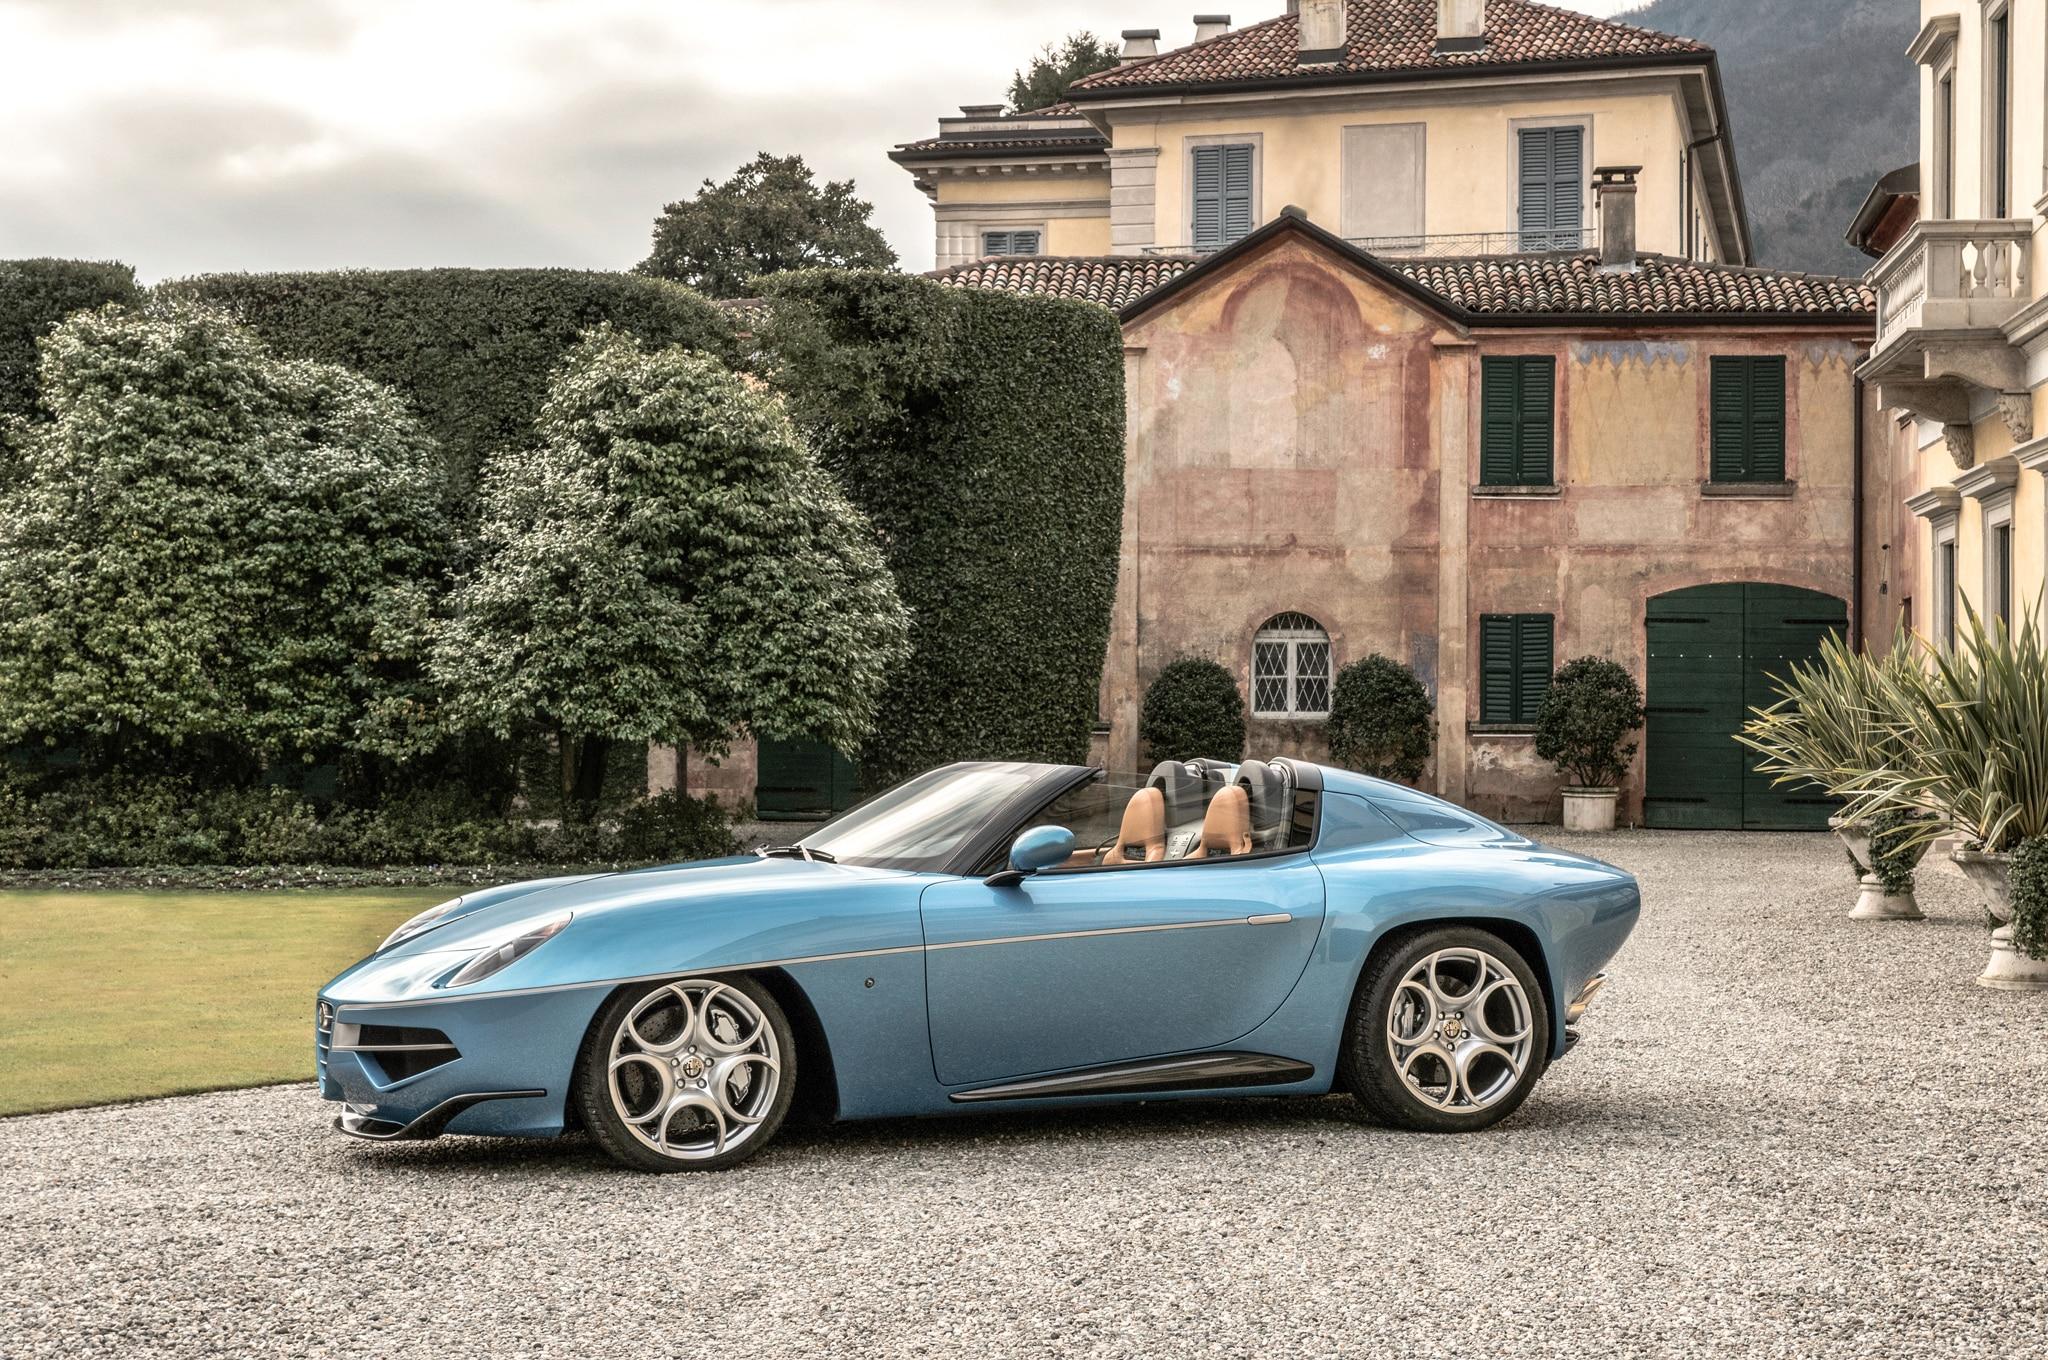 Alfa Romeo Disco Volante Price >> Carrozzeria Touring Unveils Alfa Romeo Disco Volante Spider | Automobile Magazine